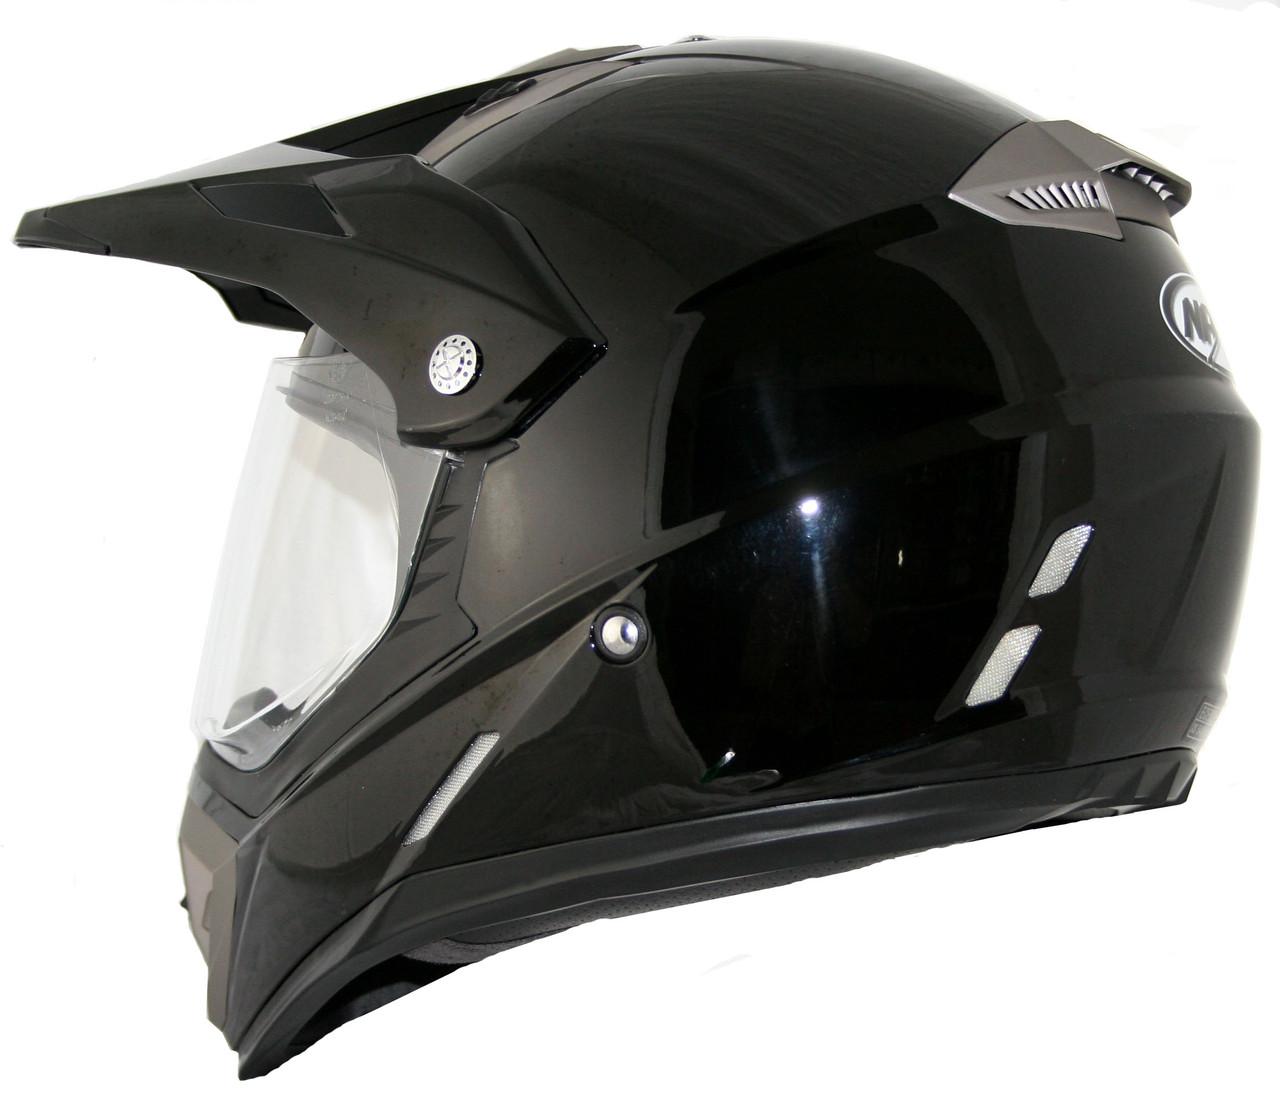 Мотоциклетный шлем NAXA CROSS ENDURO CO2A r.S